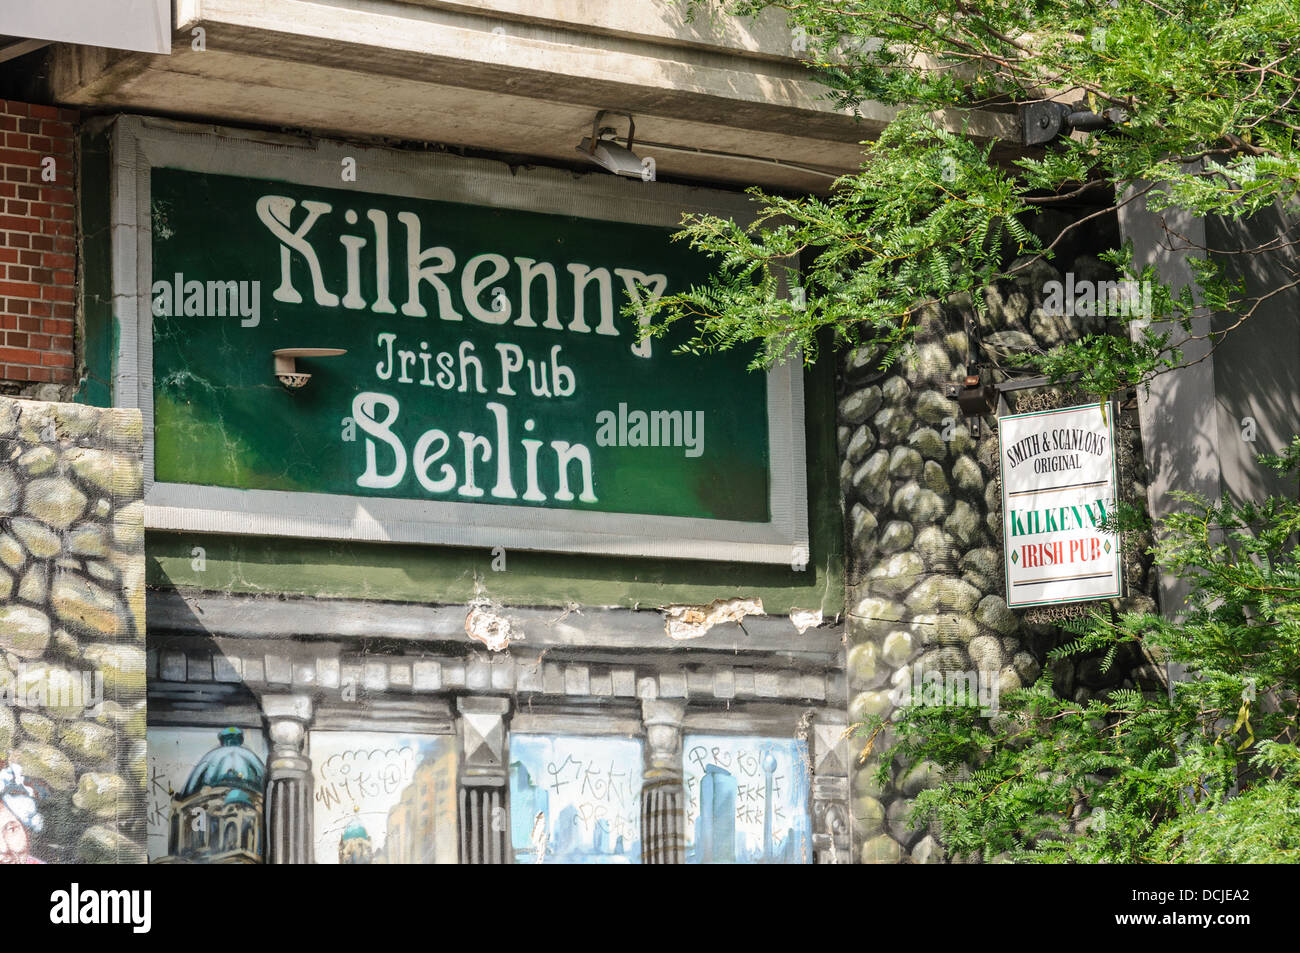 Kilkenny Irish Pub Berlin - Smith & Scanlons - Hackescher Markt, Hacke's Market, Berlin Germany - Stock Image